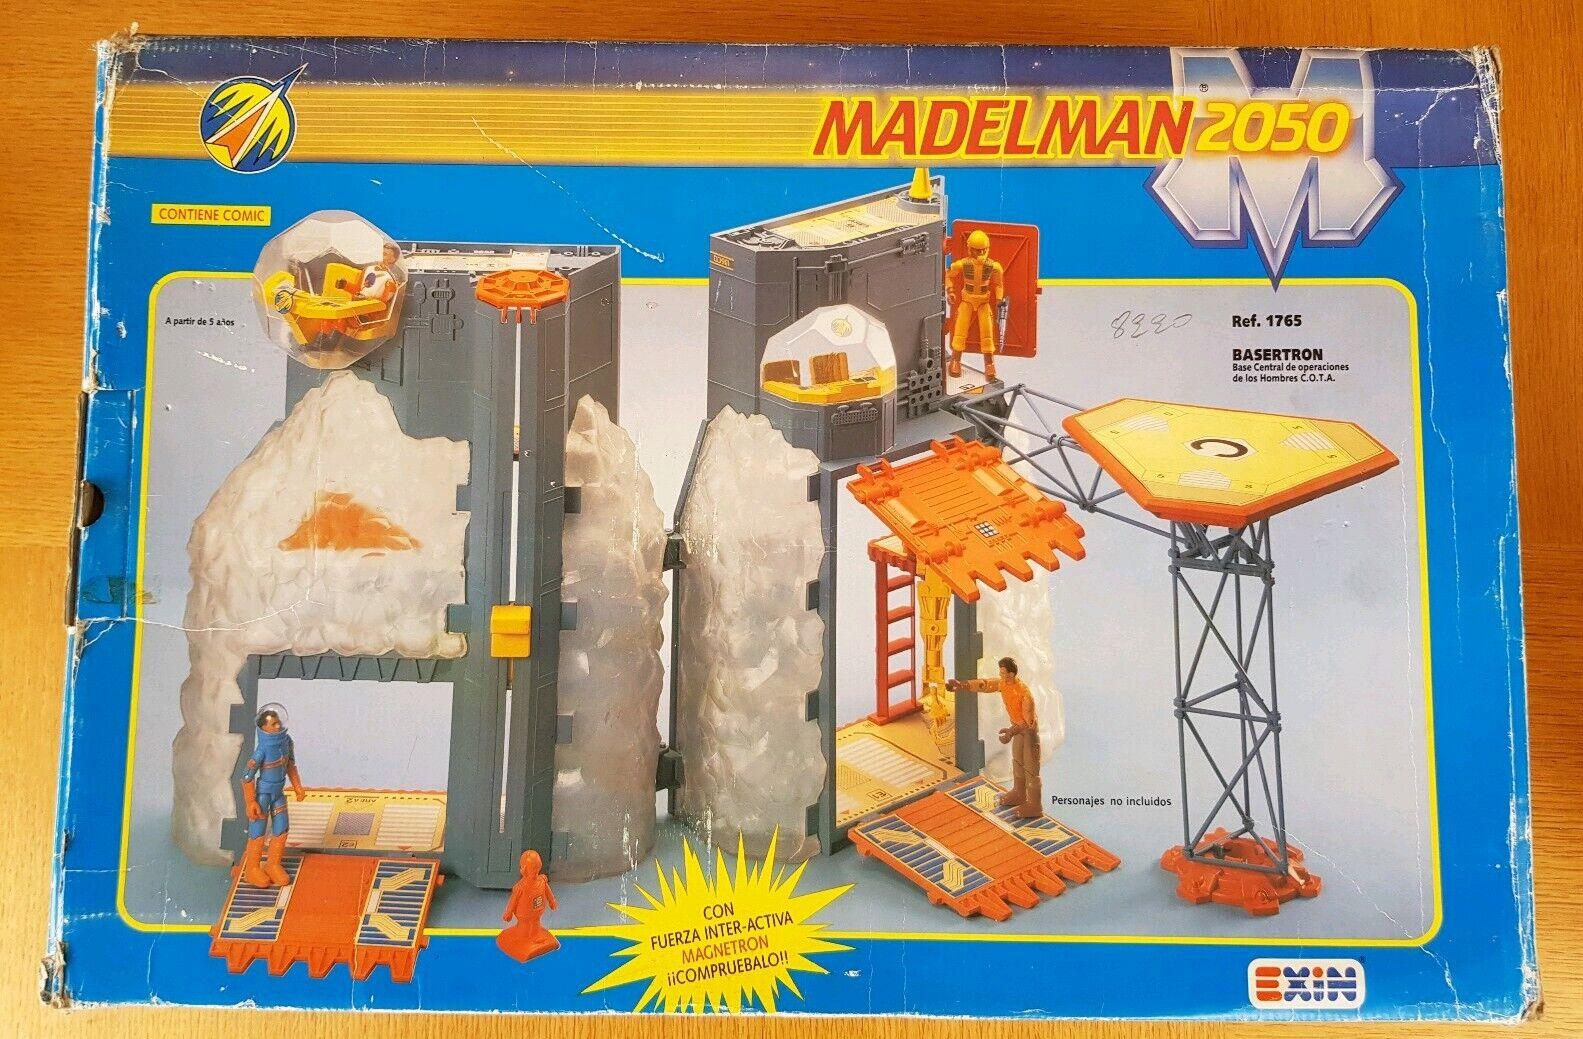 Madelman 2050 c.o.t.a basertron Jugarset En Caja Completa Gi Joe Estrella Wars 1988